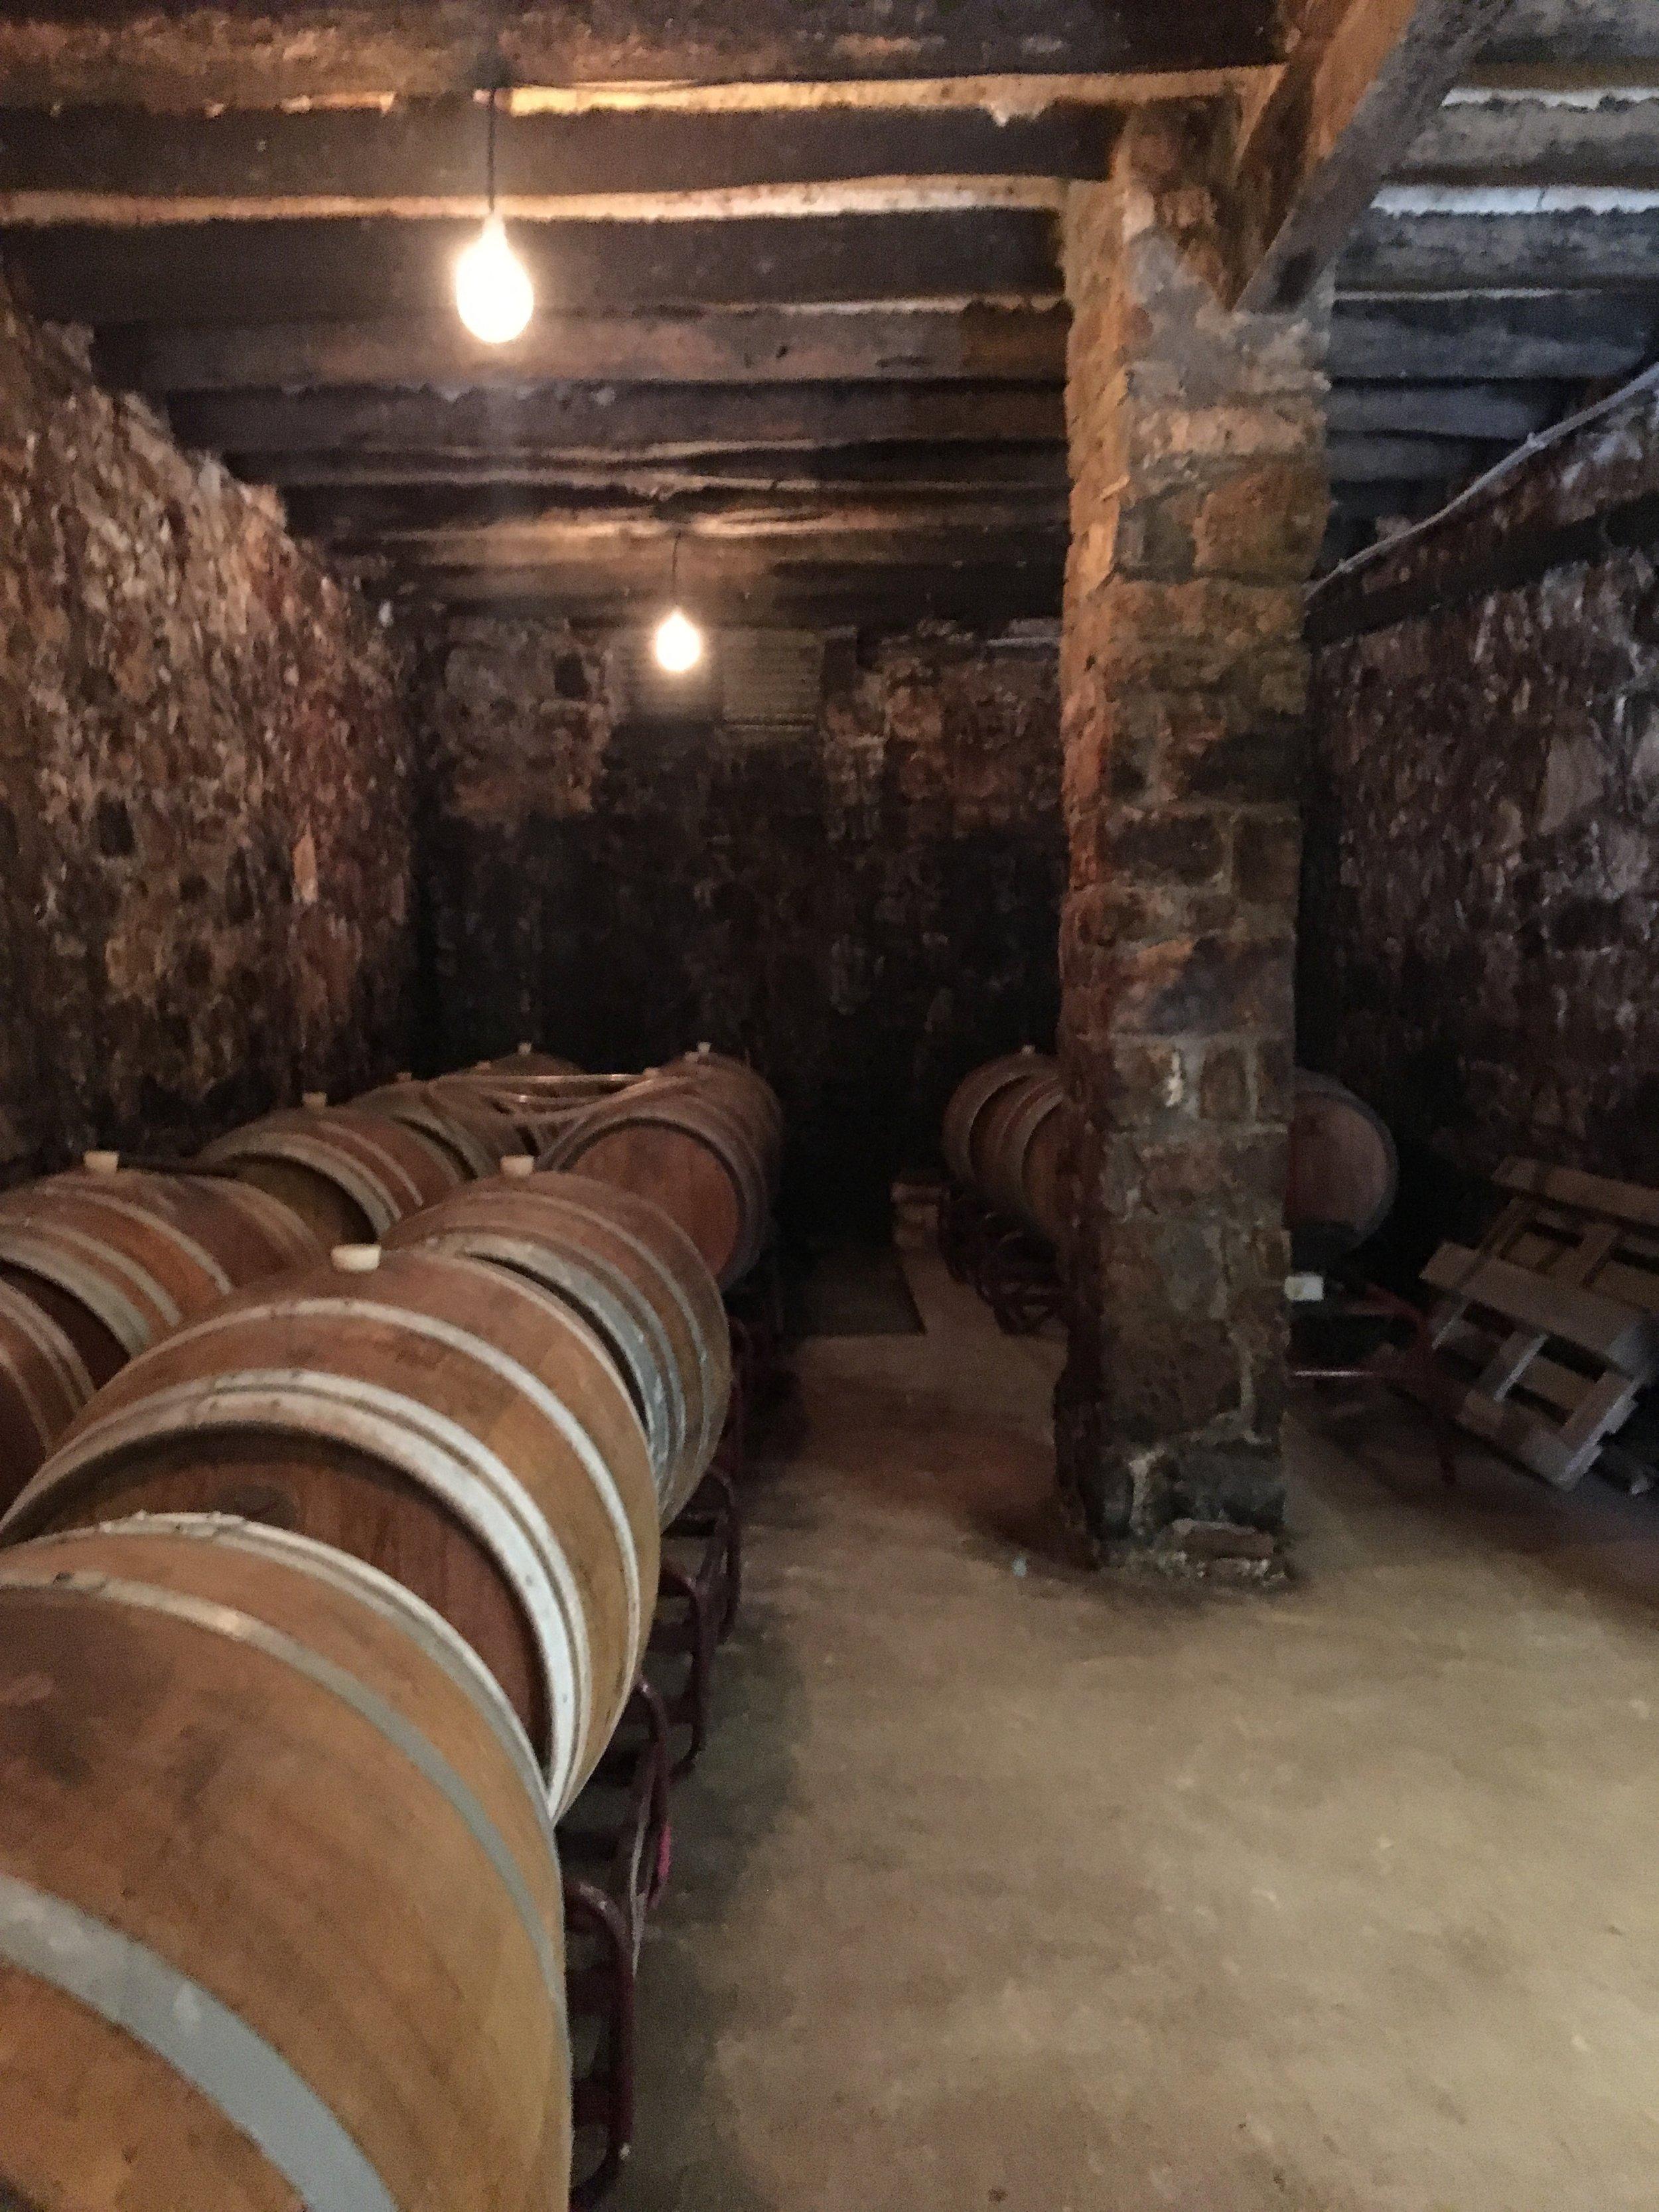 Cuprum sleeping in its oak barrels. Shhh!